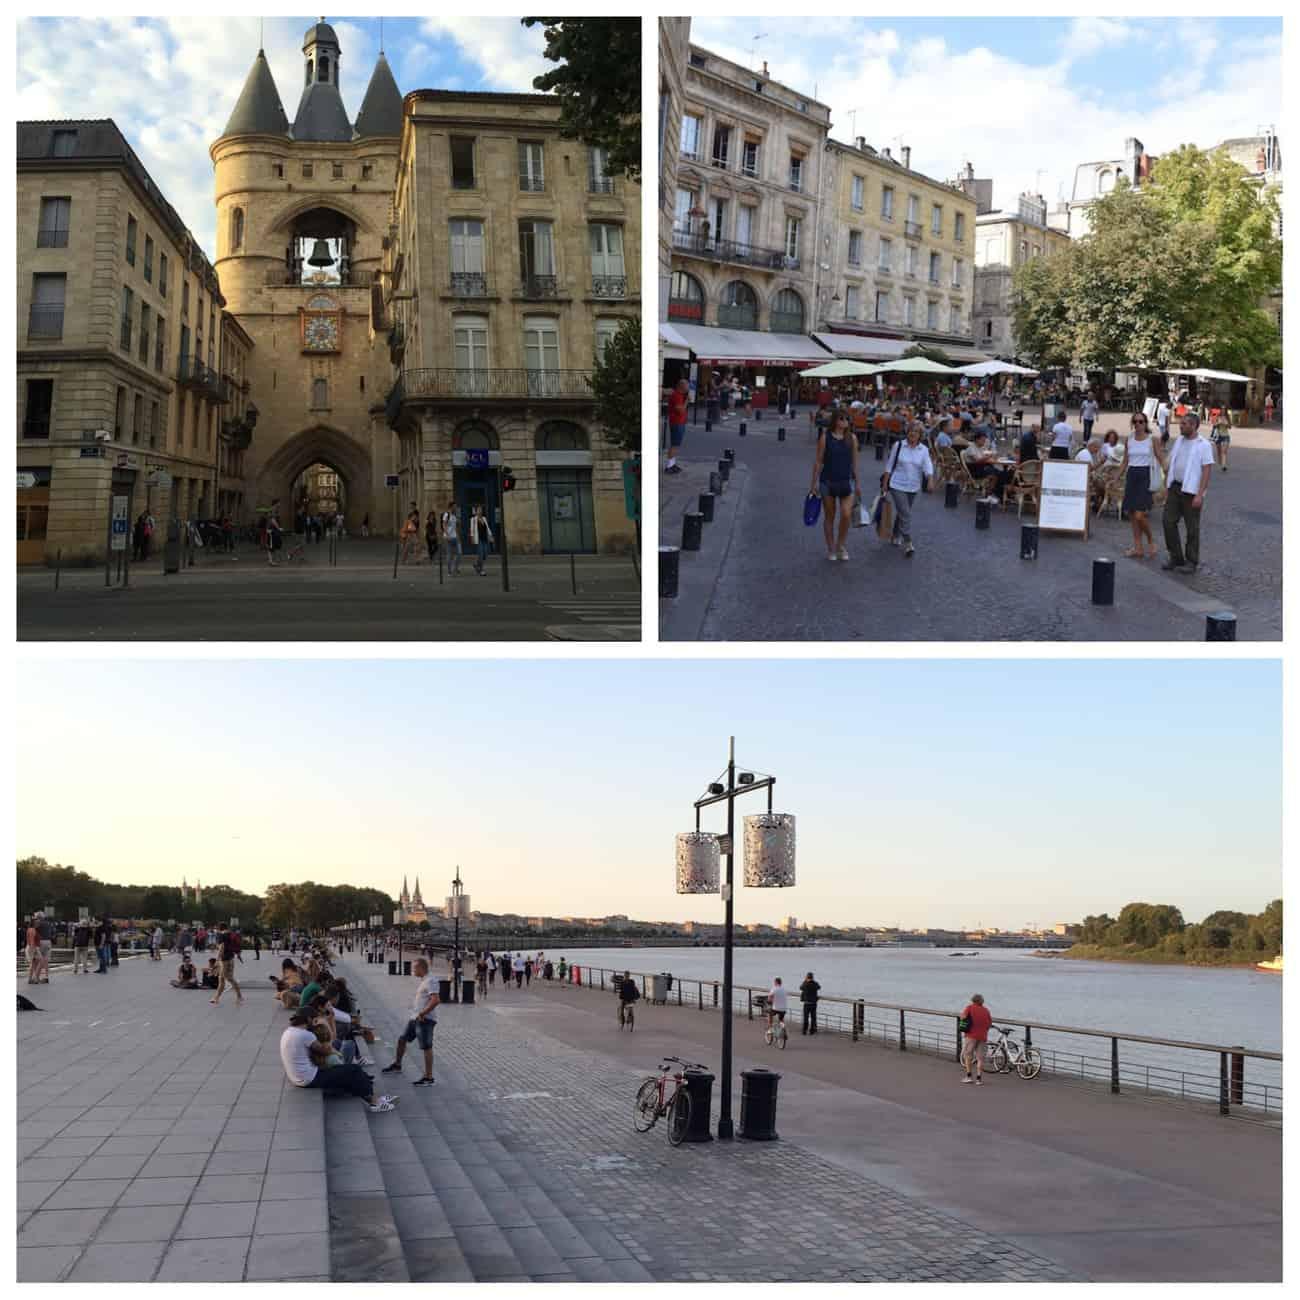 Bordeaux - medieval gate and esplanade